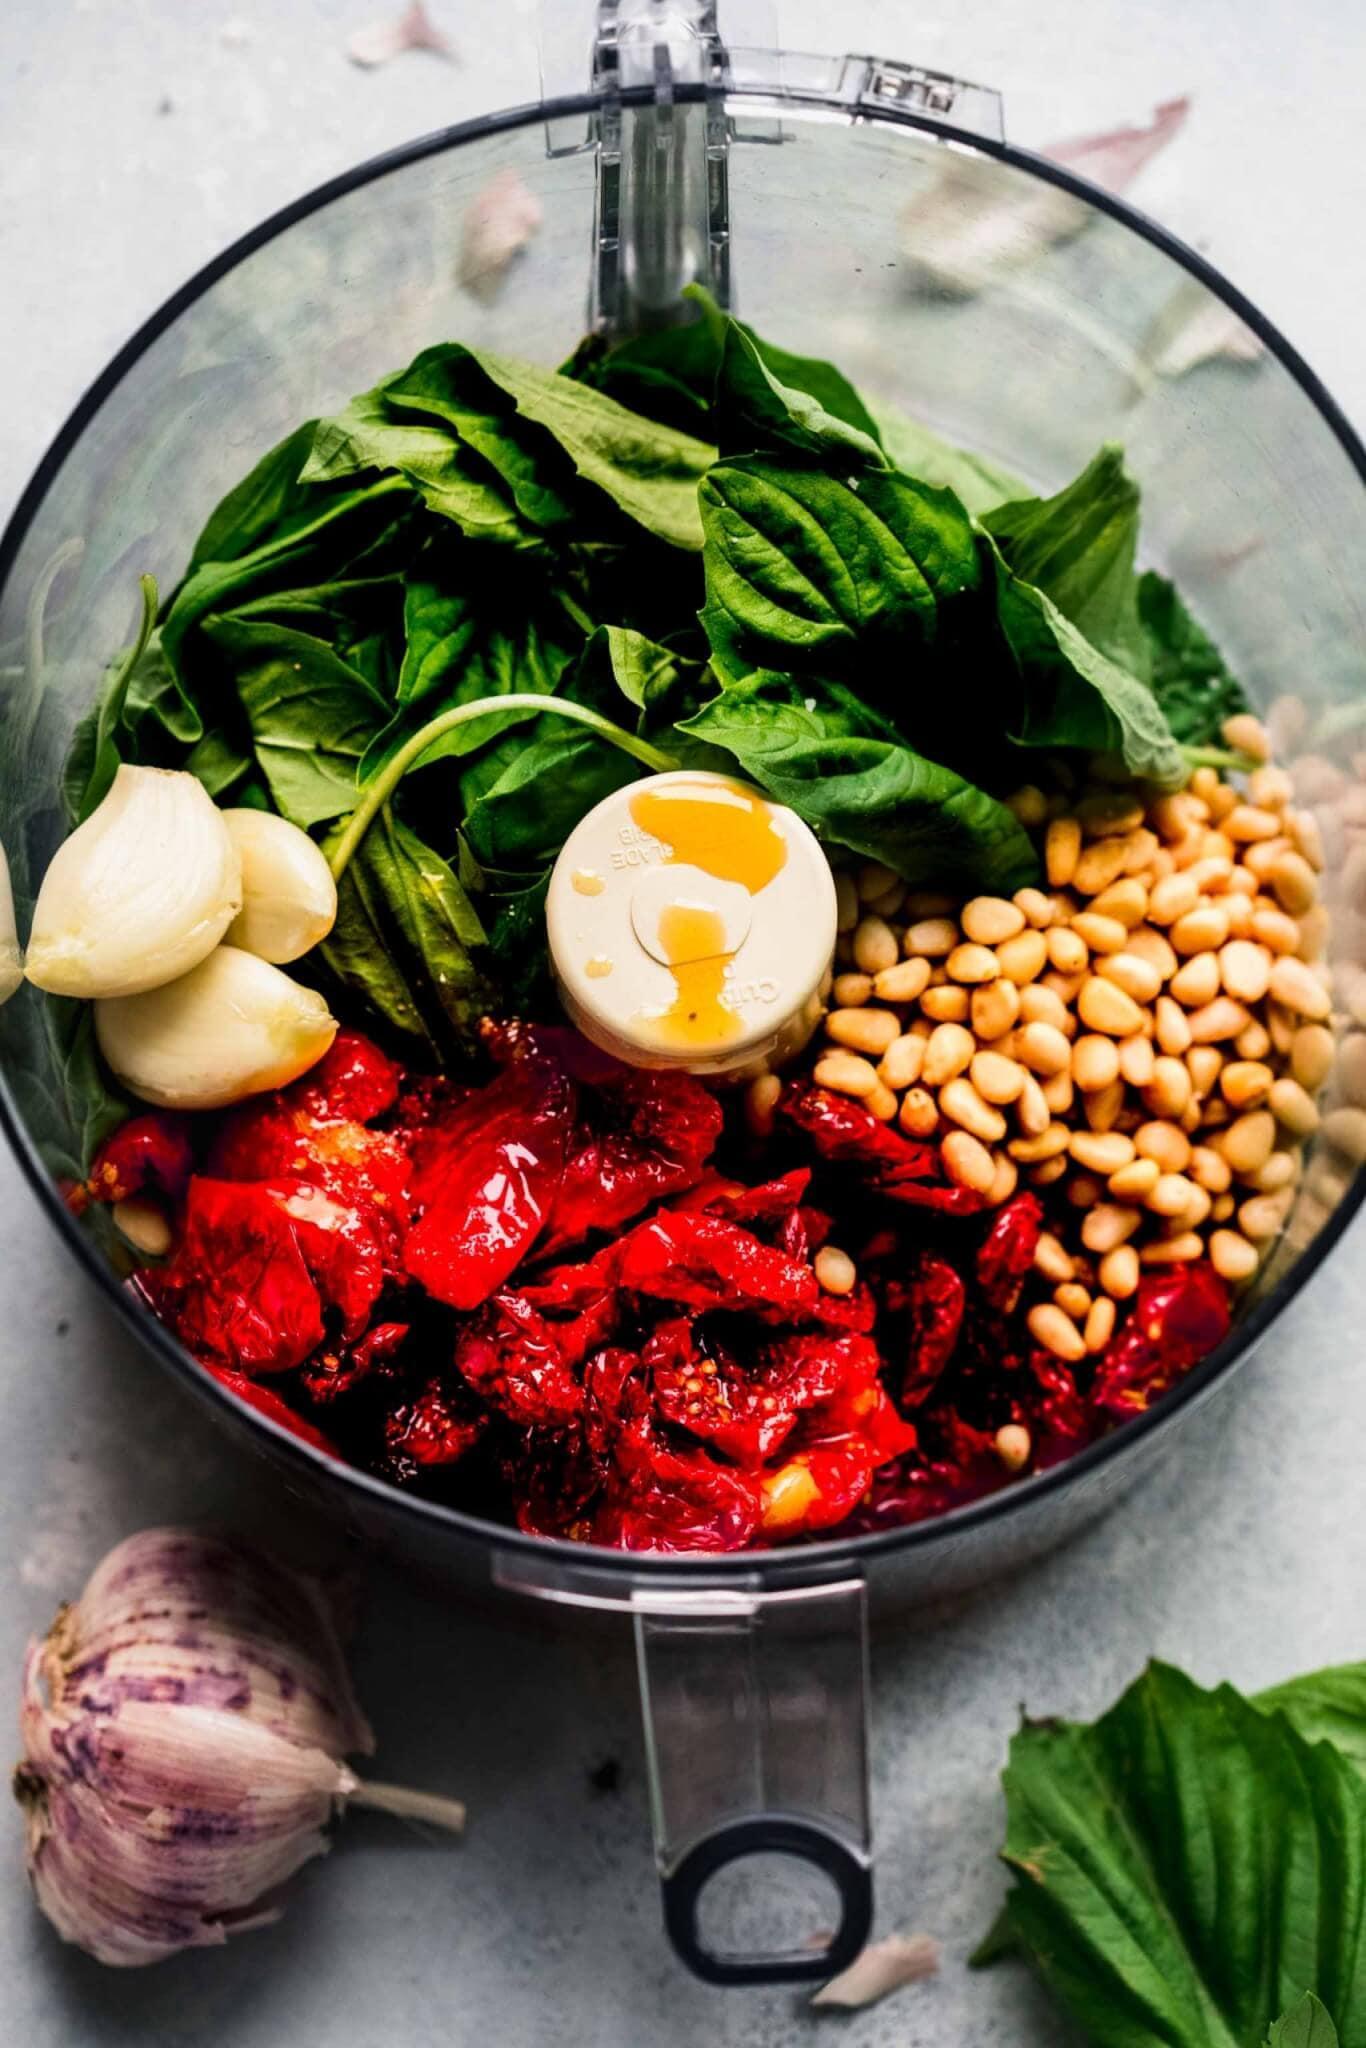 Ingredients for tomato pesto in food processor.